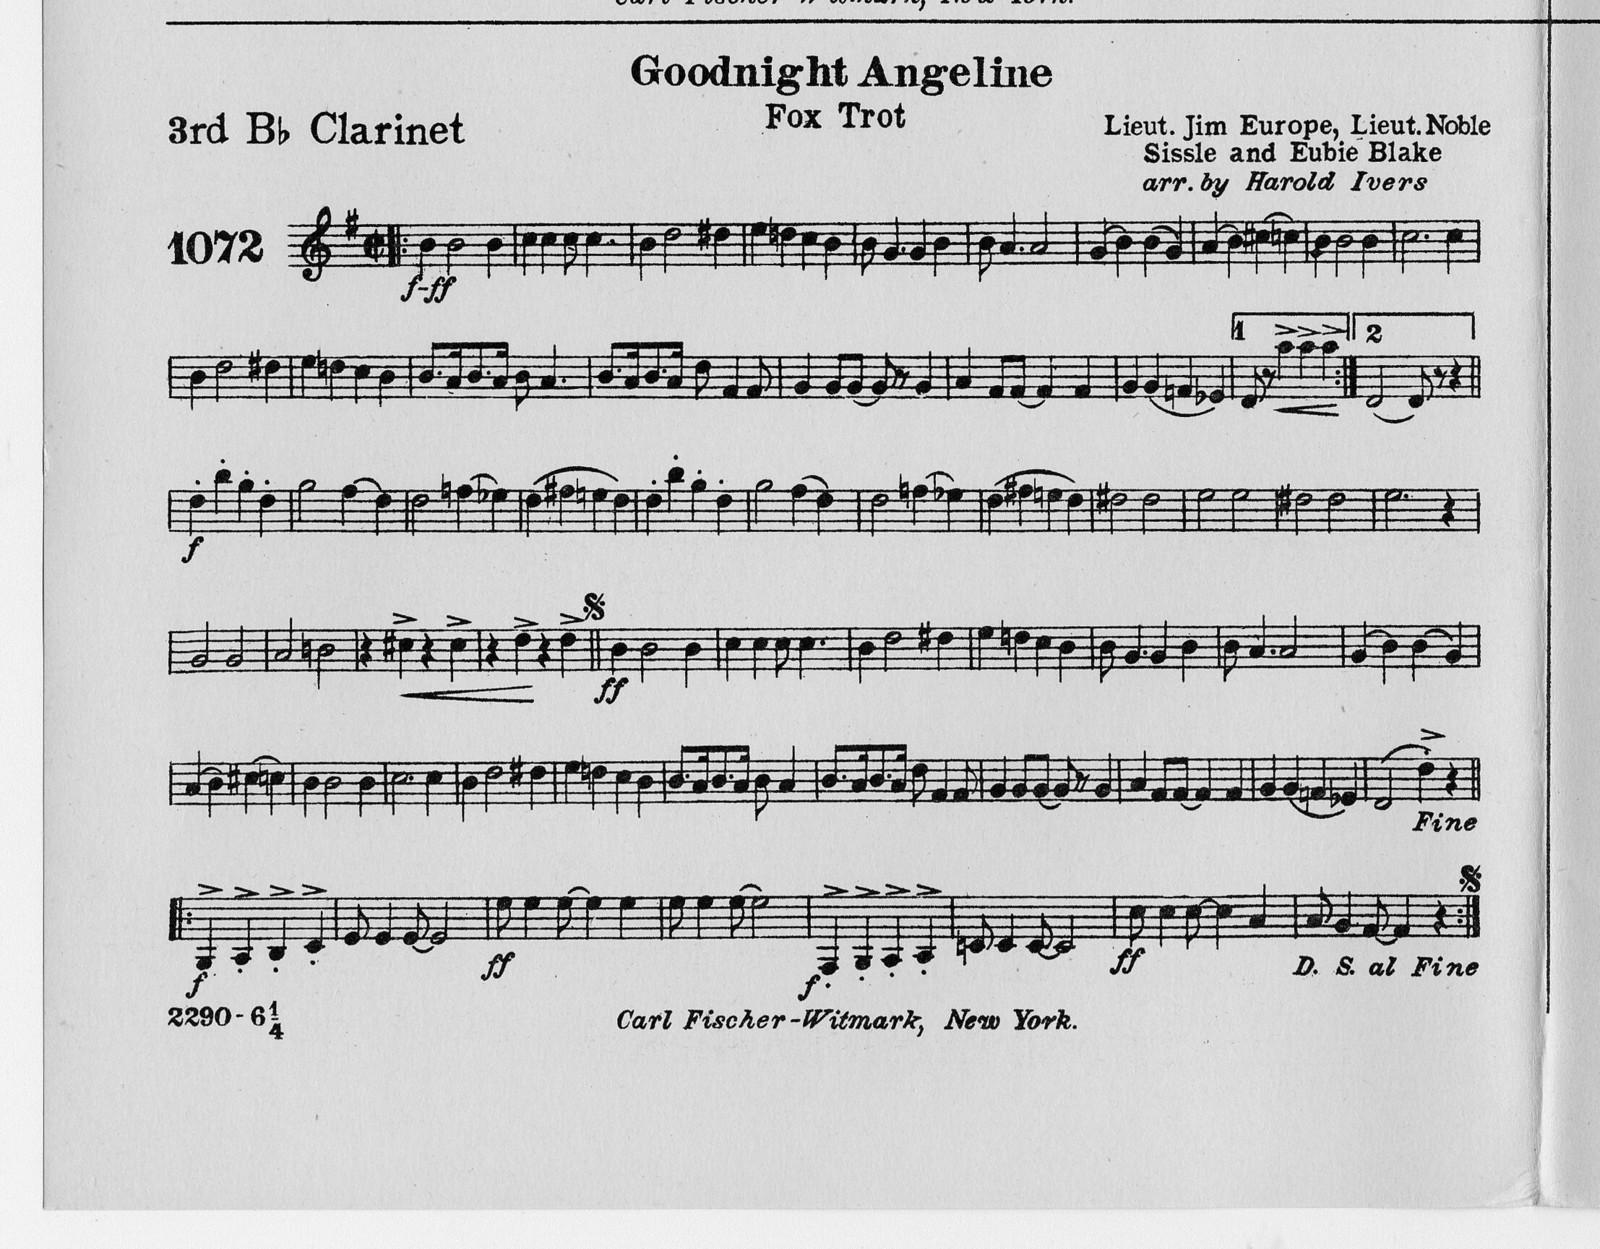 Goodnight Angeline